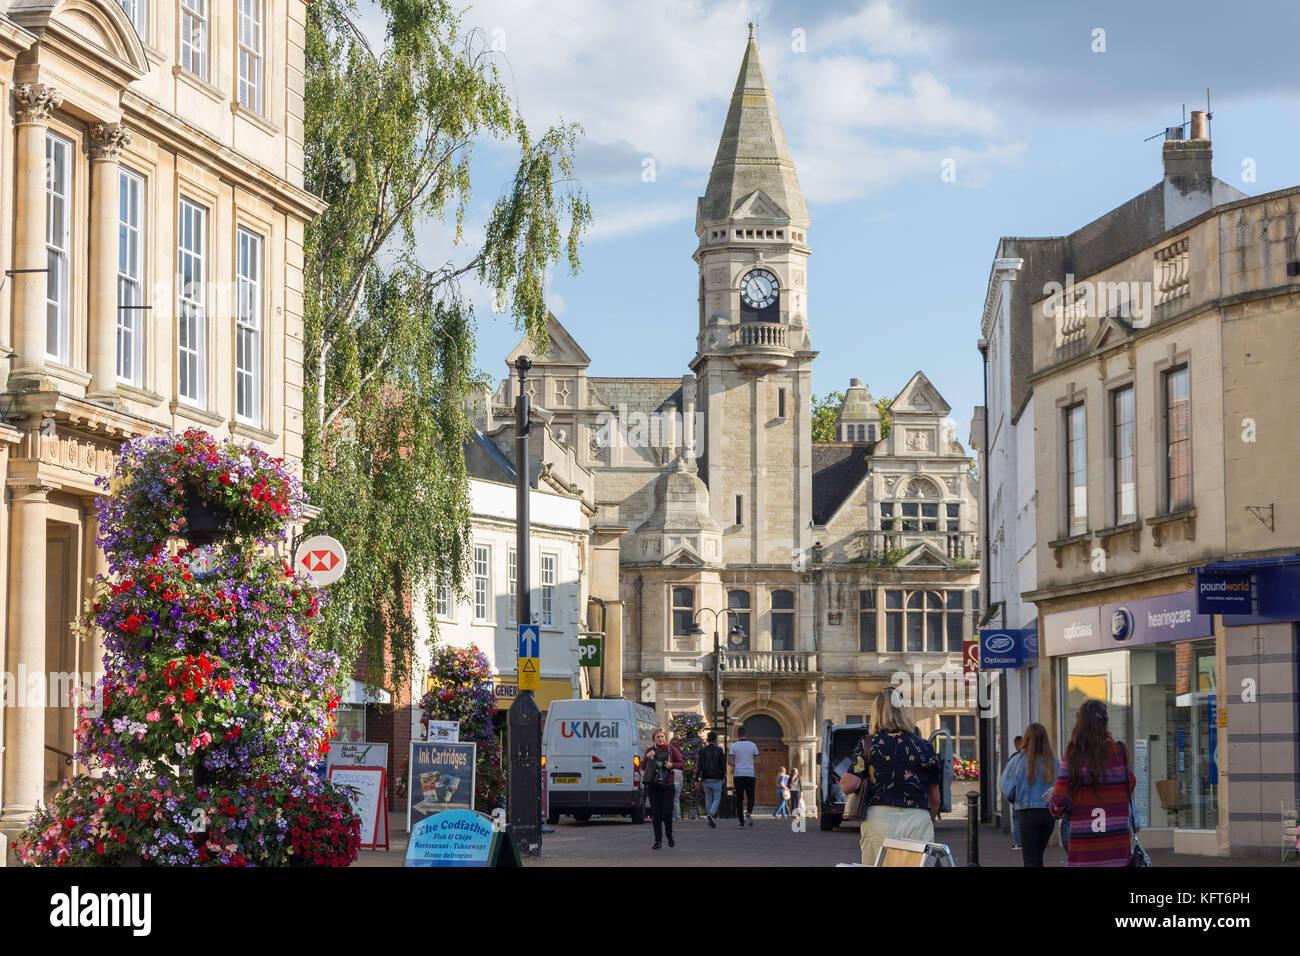 Trowbridge Town Hall, Fore Street, Trowbridge, Wiltshire, England, United Kingdom - Stock Image